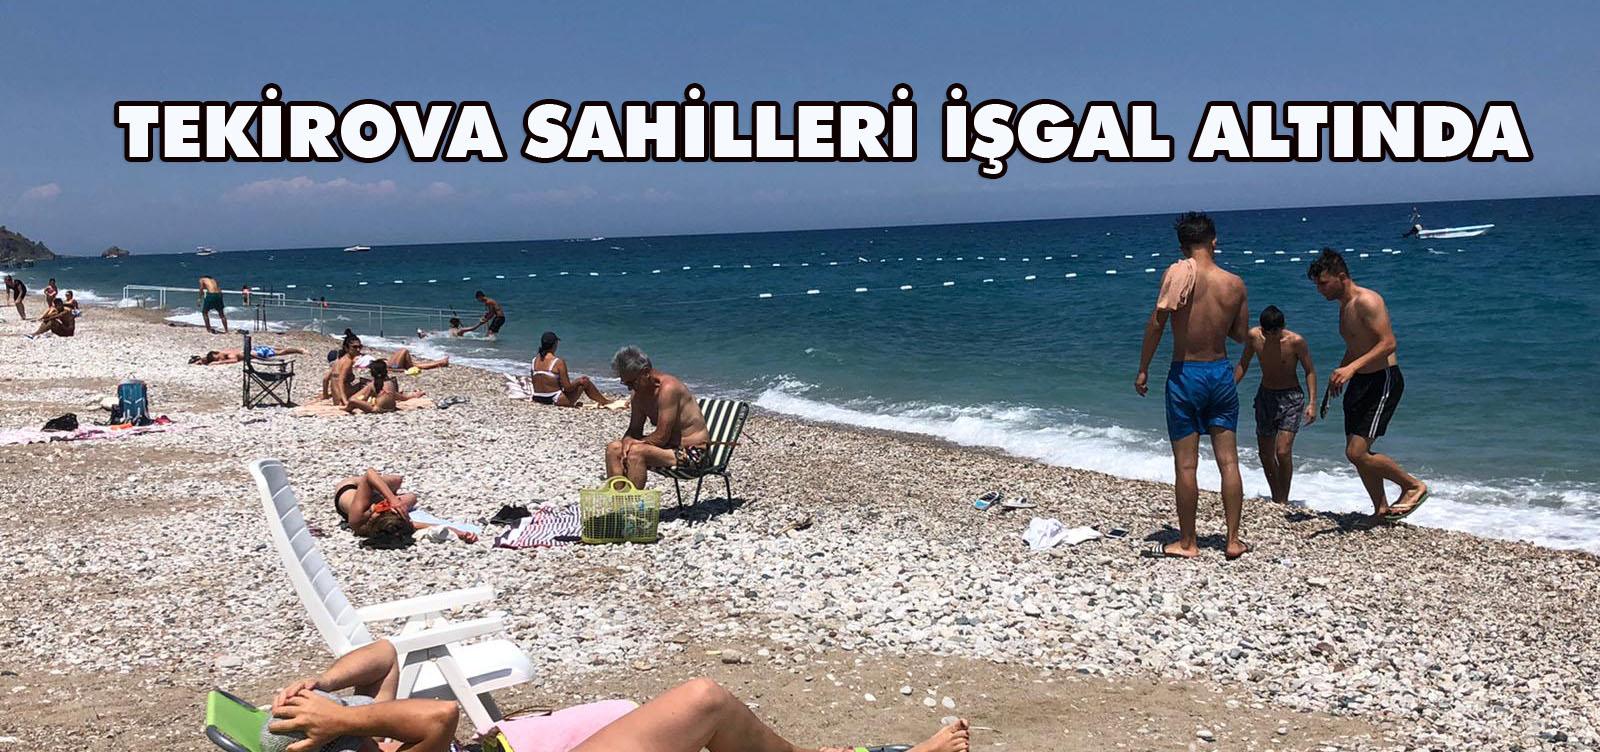 TEKİROVA SAHİLLERİ İŞGAL ALTINDA